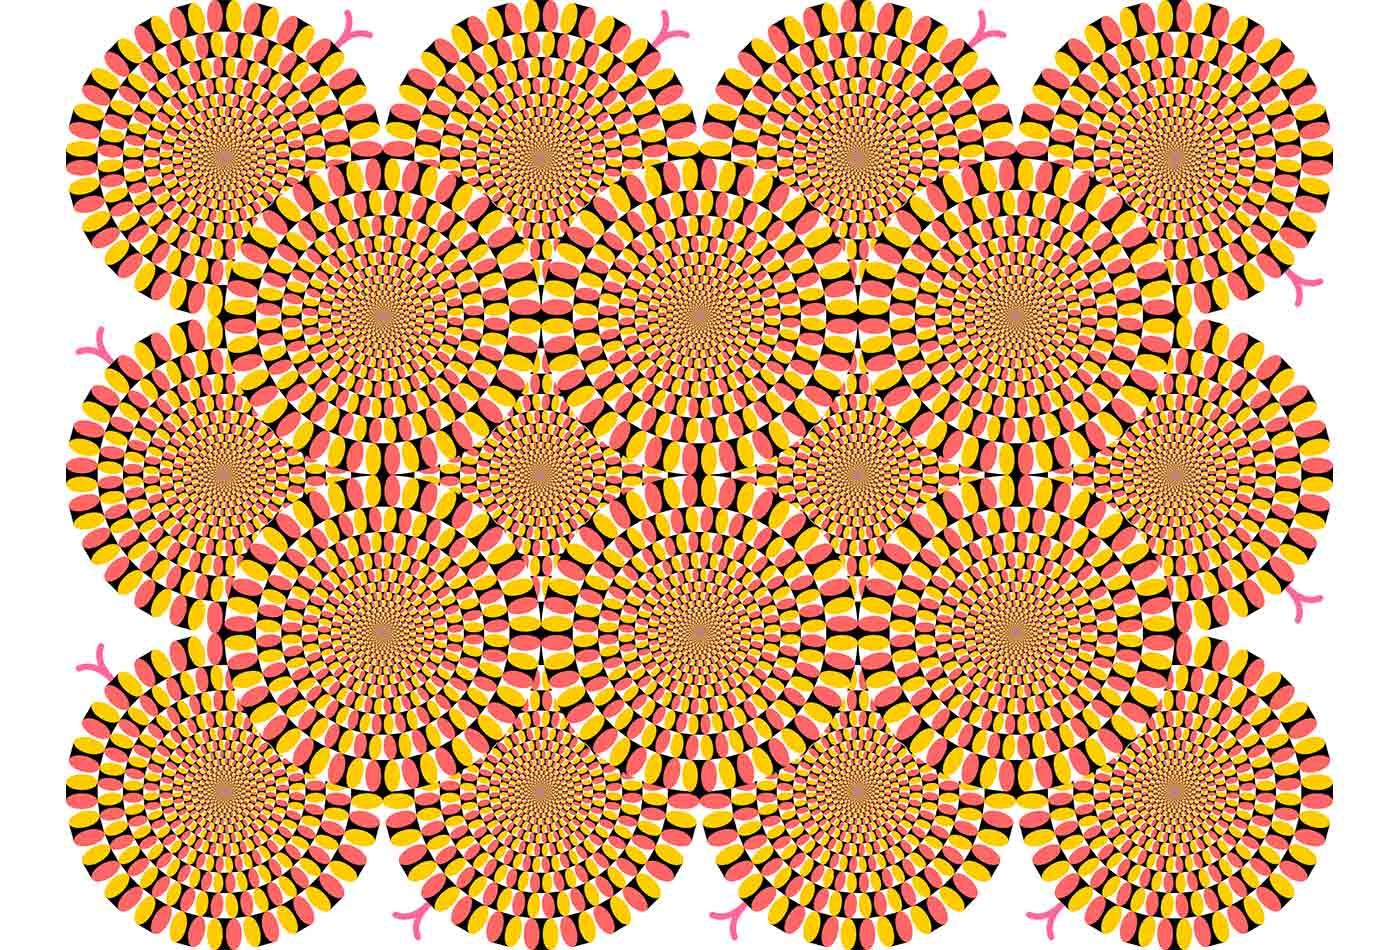 An optical illusion similar to Rotating Snakes by Kitaoka Akiyoshi.